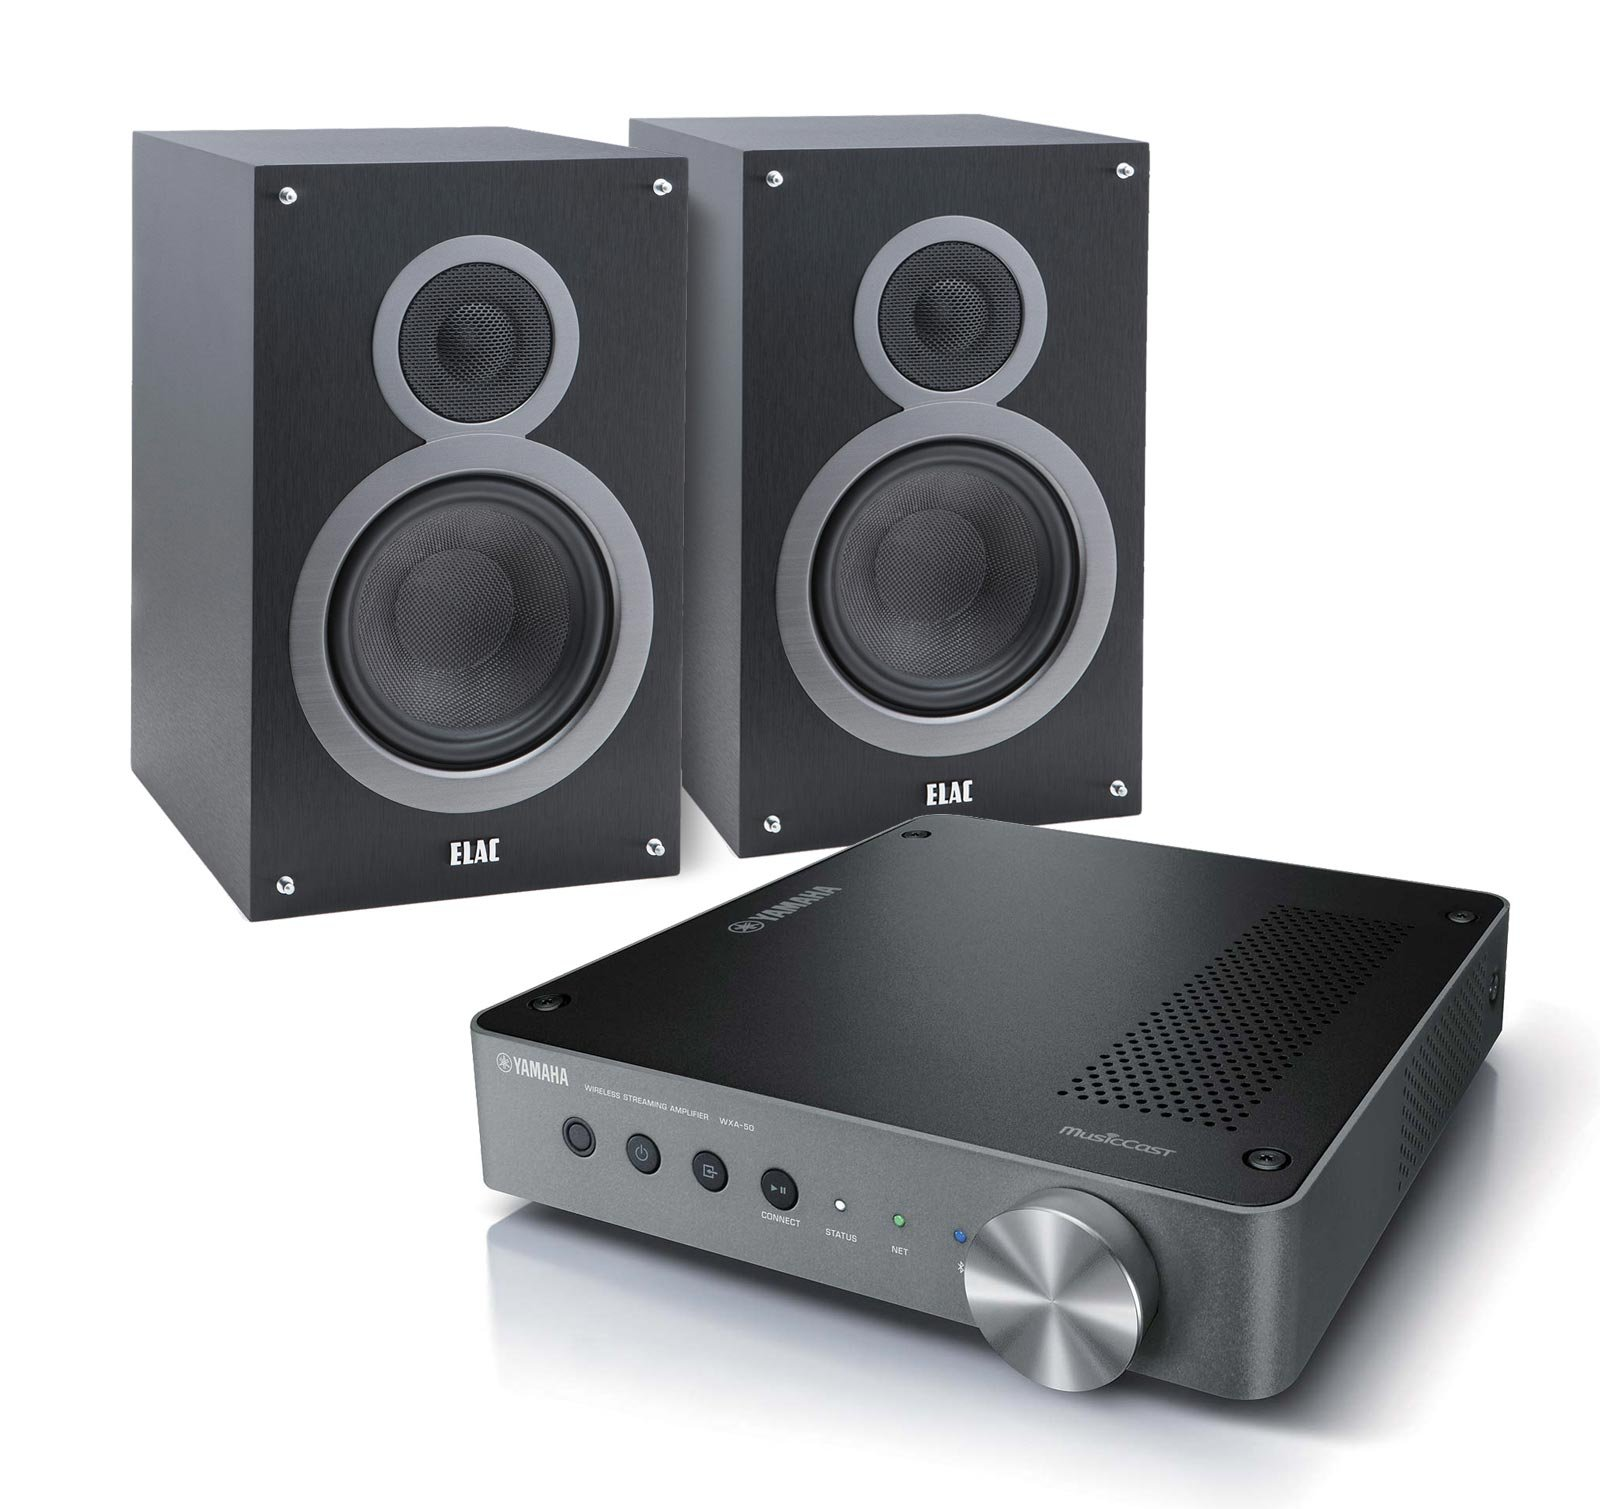 Yamaha MusicCast WXA-50 Audio Component Amplifier (Dark Silver) with ELAC Debut B6 2-Way Bookshelf Speakers, Pair (Black)